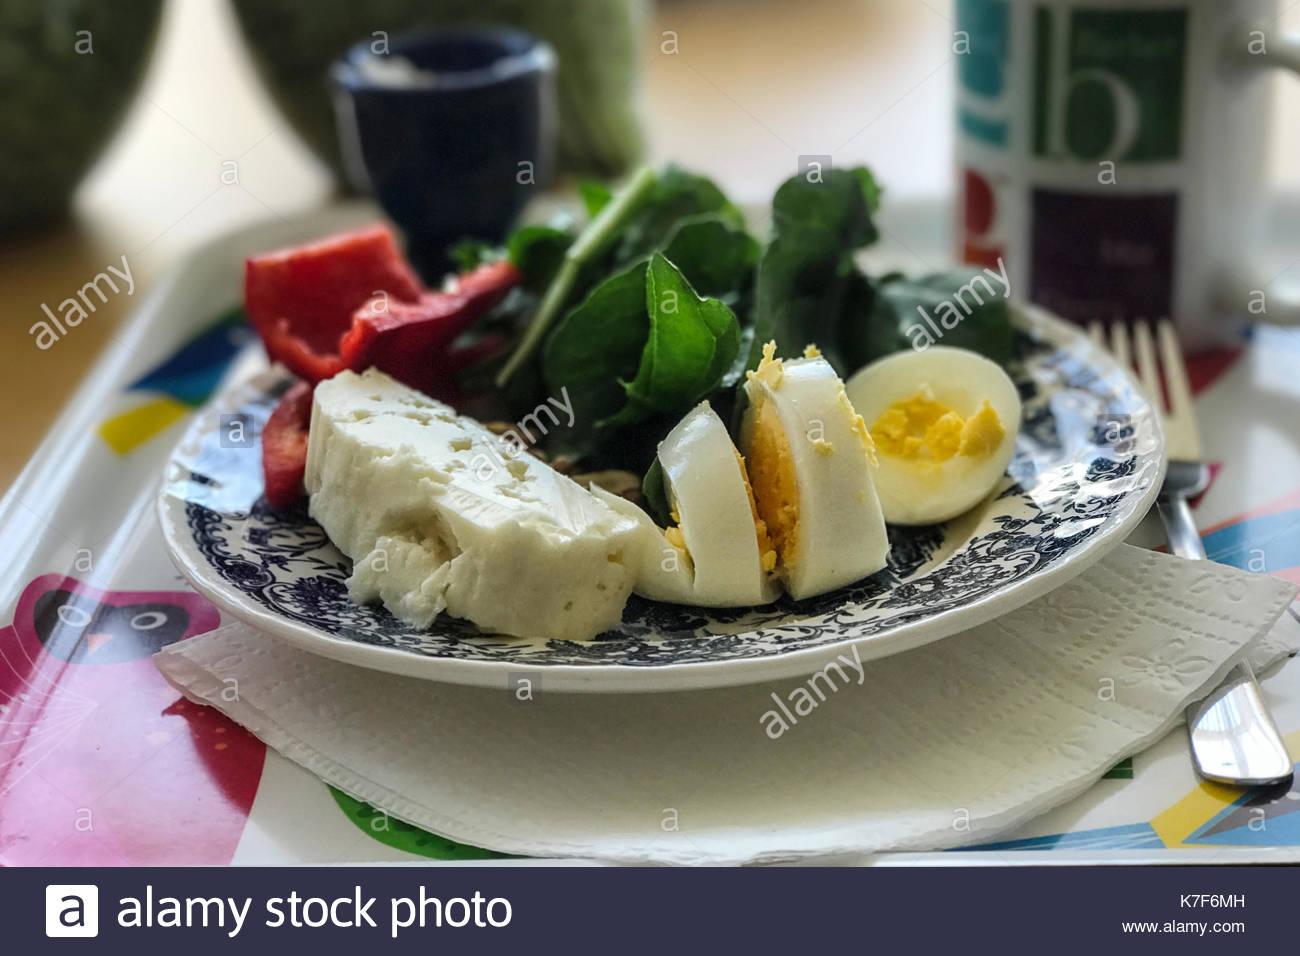 Healhty breakfast with coffee - Stock Image